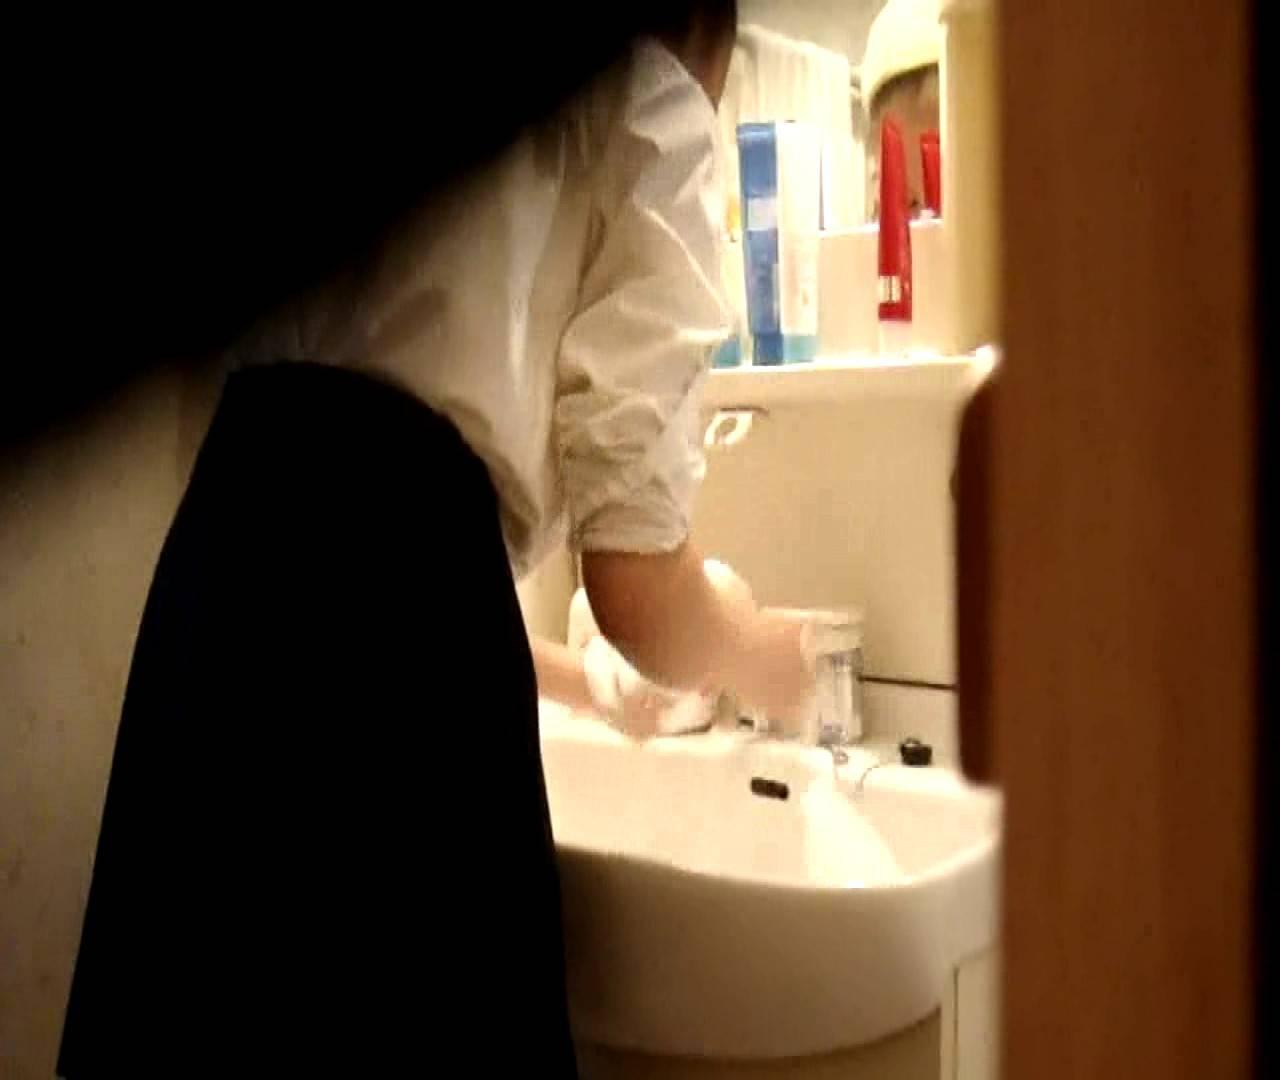 vol.5 まどかが帰宅後の洗顔後にブラを洗ってます。 ギャル達 | 民家  112枚 49